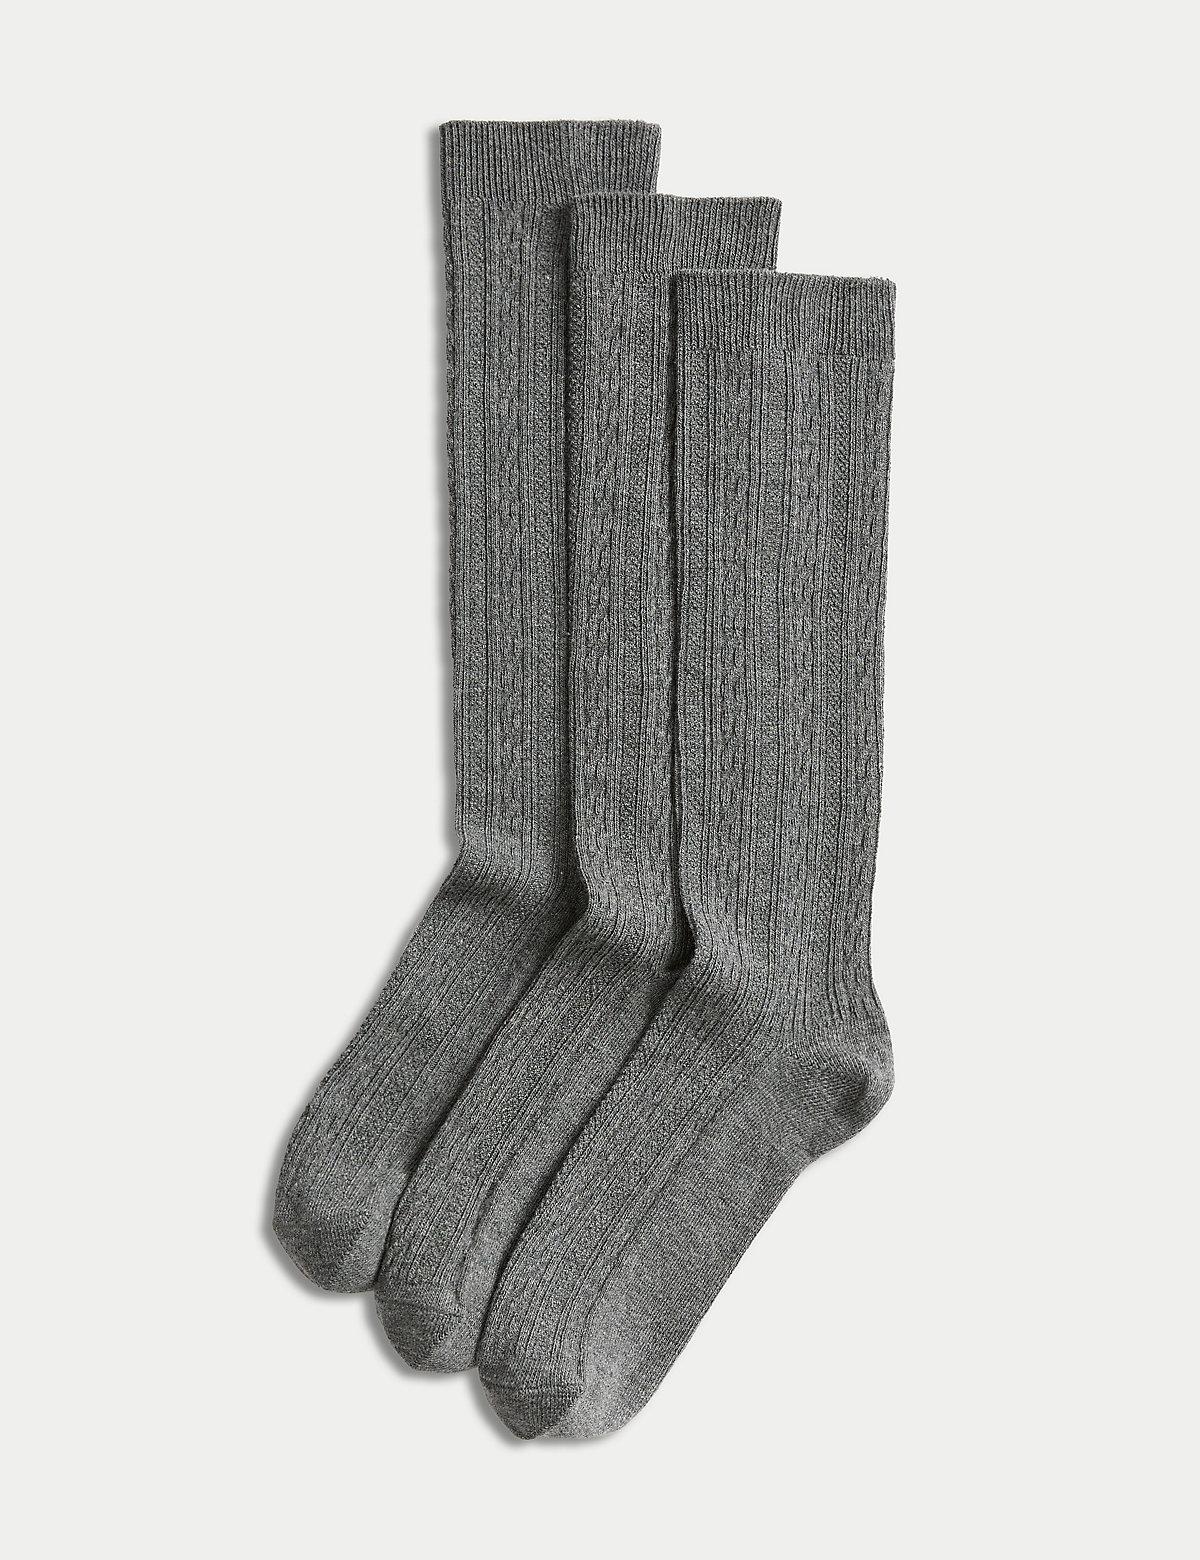 3 Pairs of Freshfeet Cable Knee High Socks (314 Years)